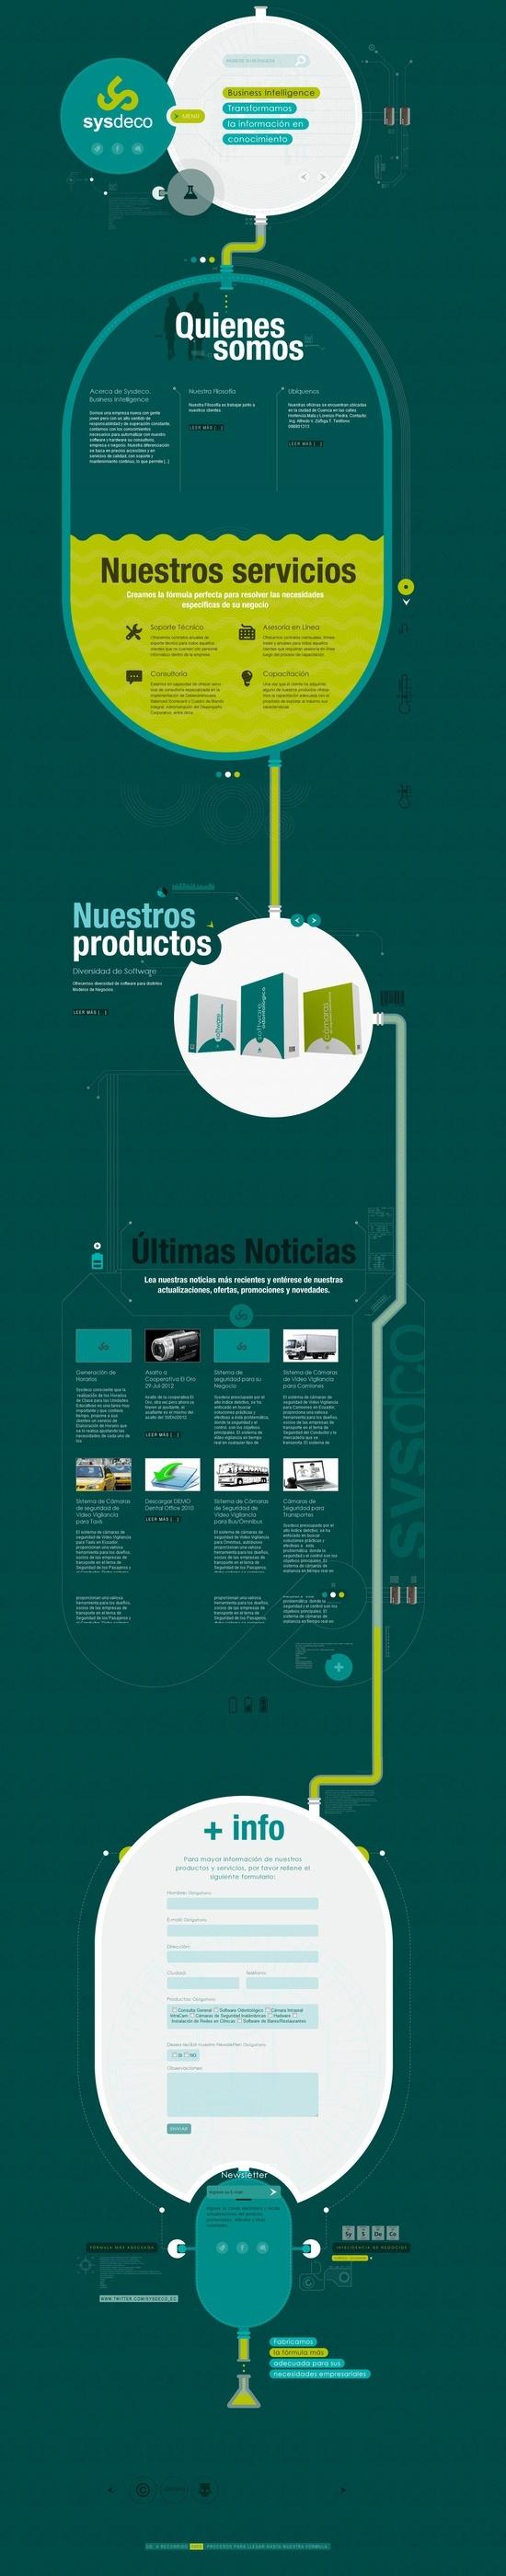 Unique Web Design, SysDeco #WebDesign #Design (http://www.pinterest.com/aldenchong/)